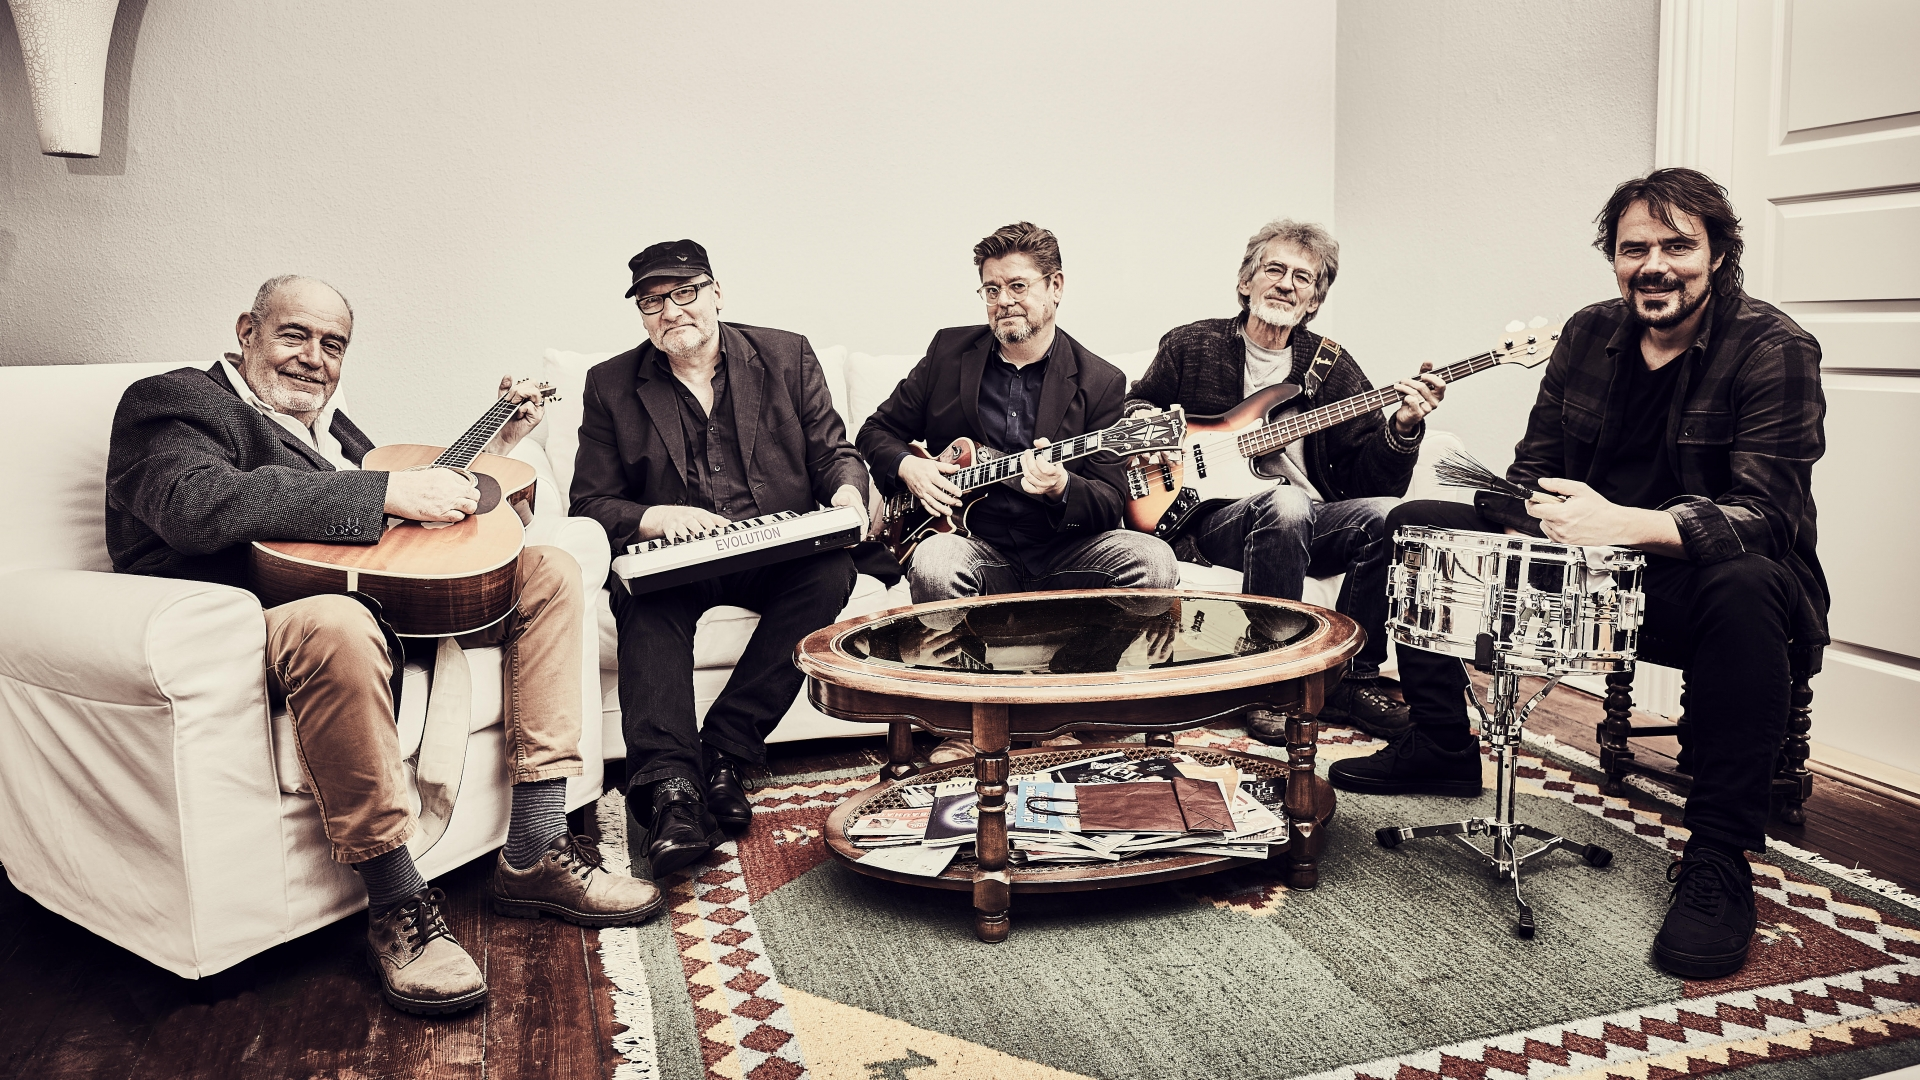 Koncert: Lasse Helner Band @ Industrien